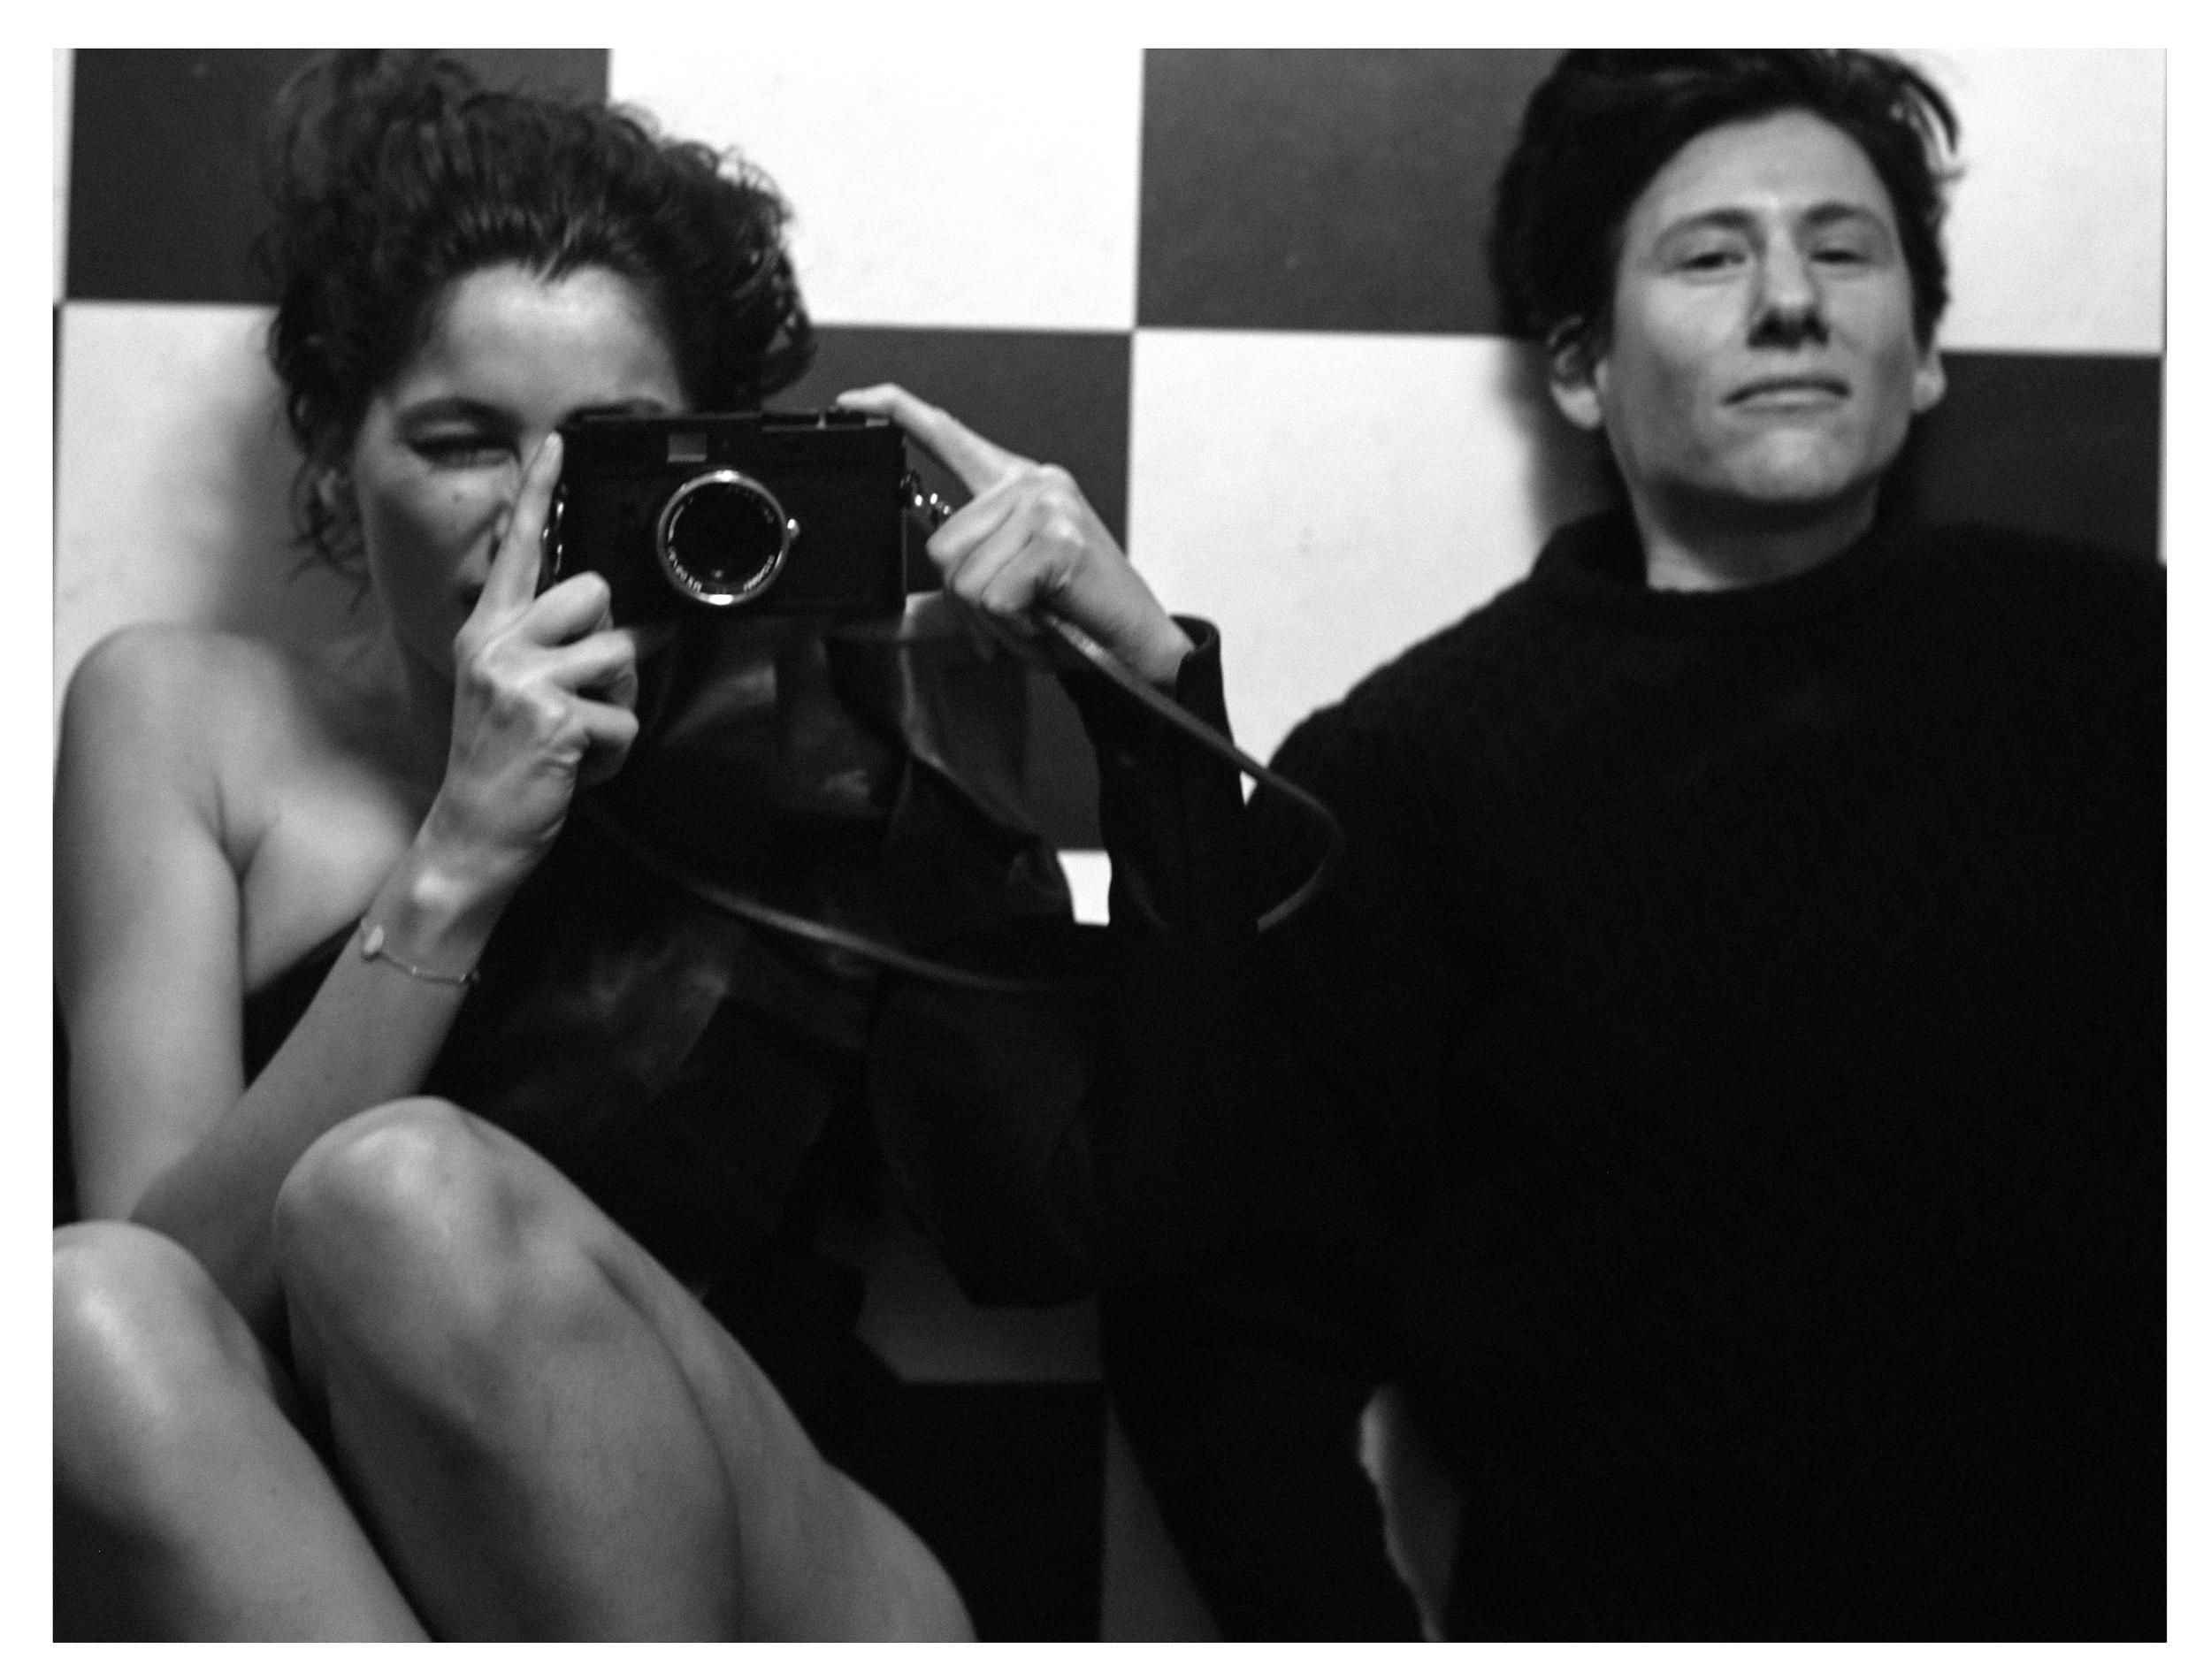 ©Collier Schorr, Laetitia with Leica, 2016 © Collier Schorr, courtesy 303 Gallery, New York